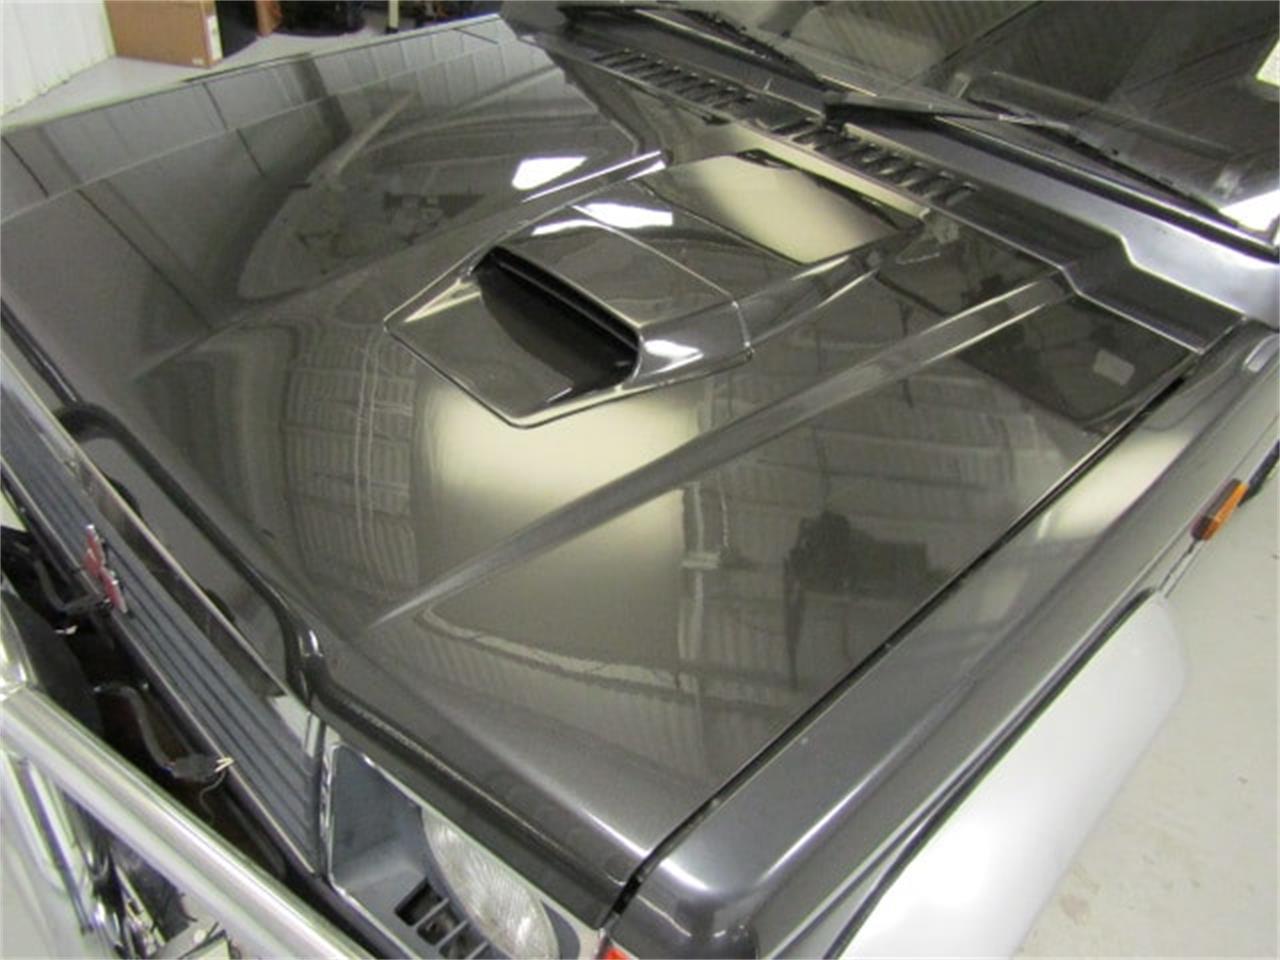 Large Picture of '90 Mitsubishi Pajero located in Virginia - $7,900.00 - K54B